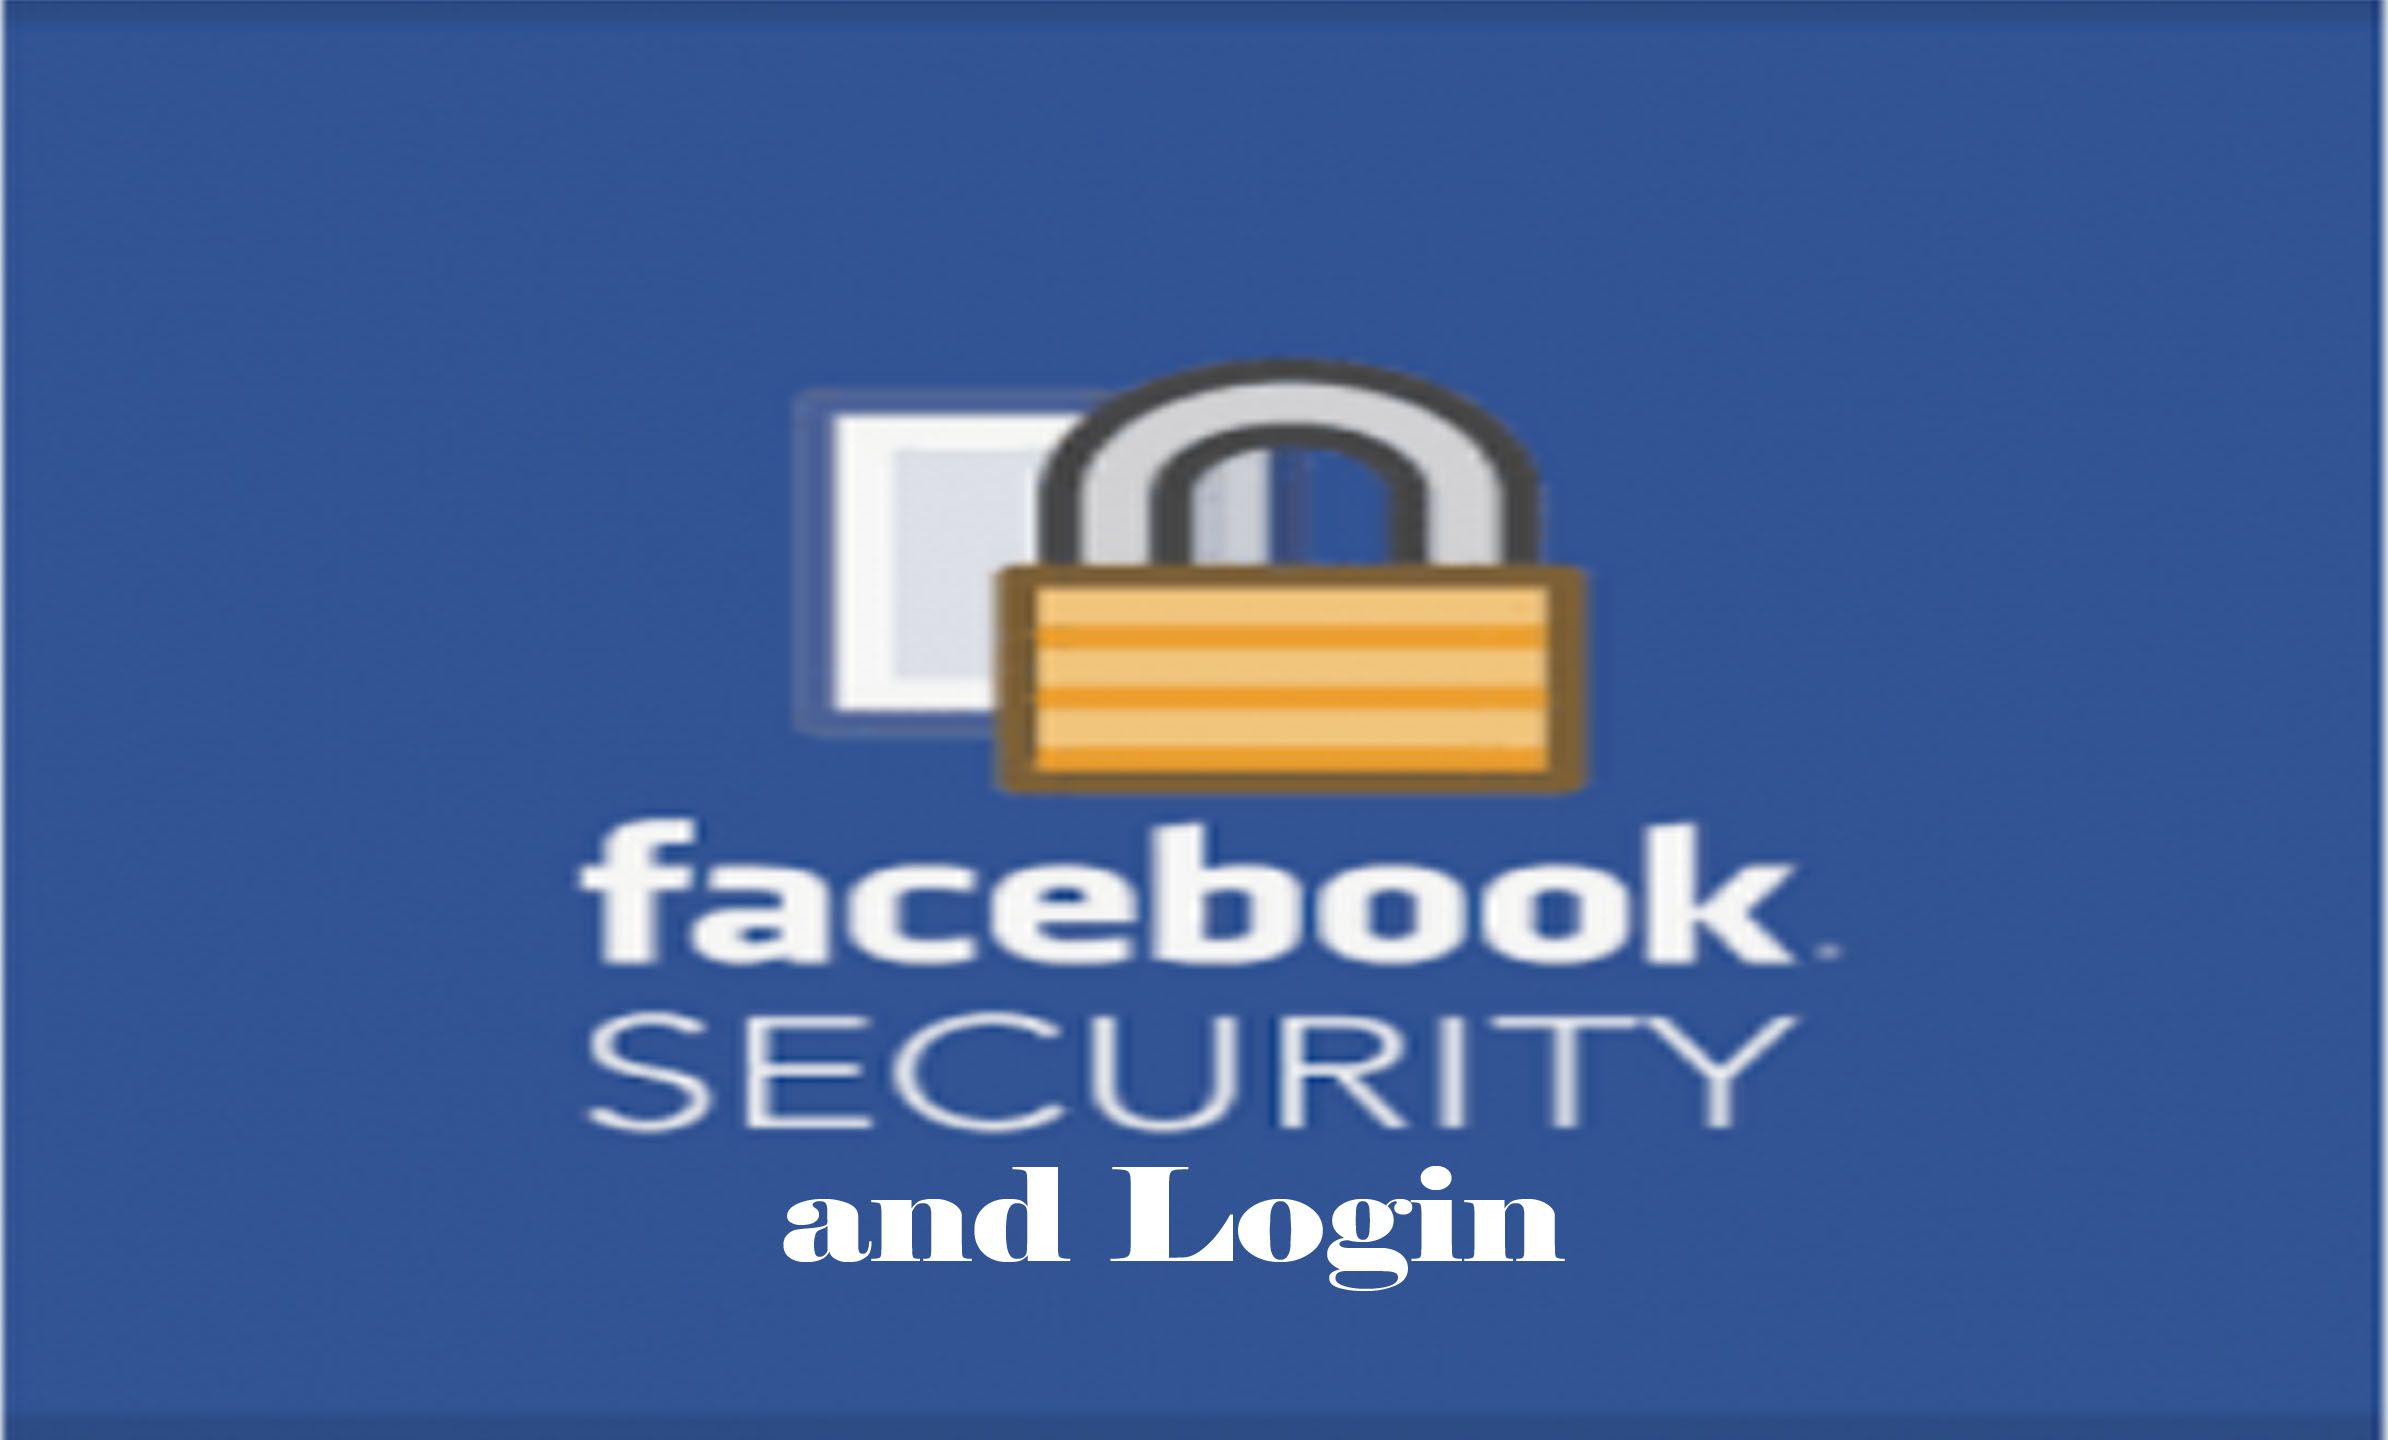 Facebook Security Settings – Facebook Security And Login | www.Facebook.com